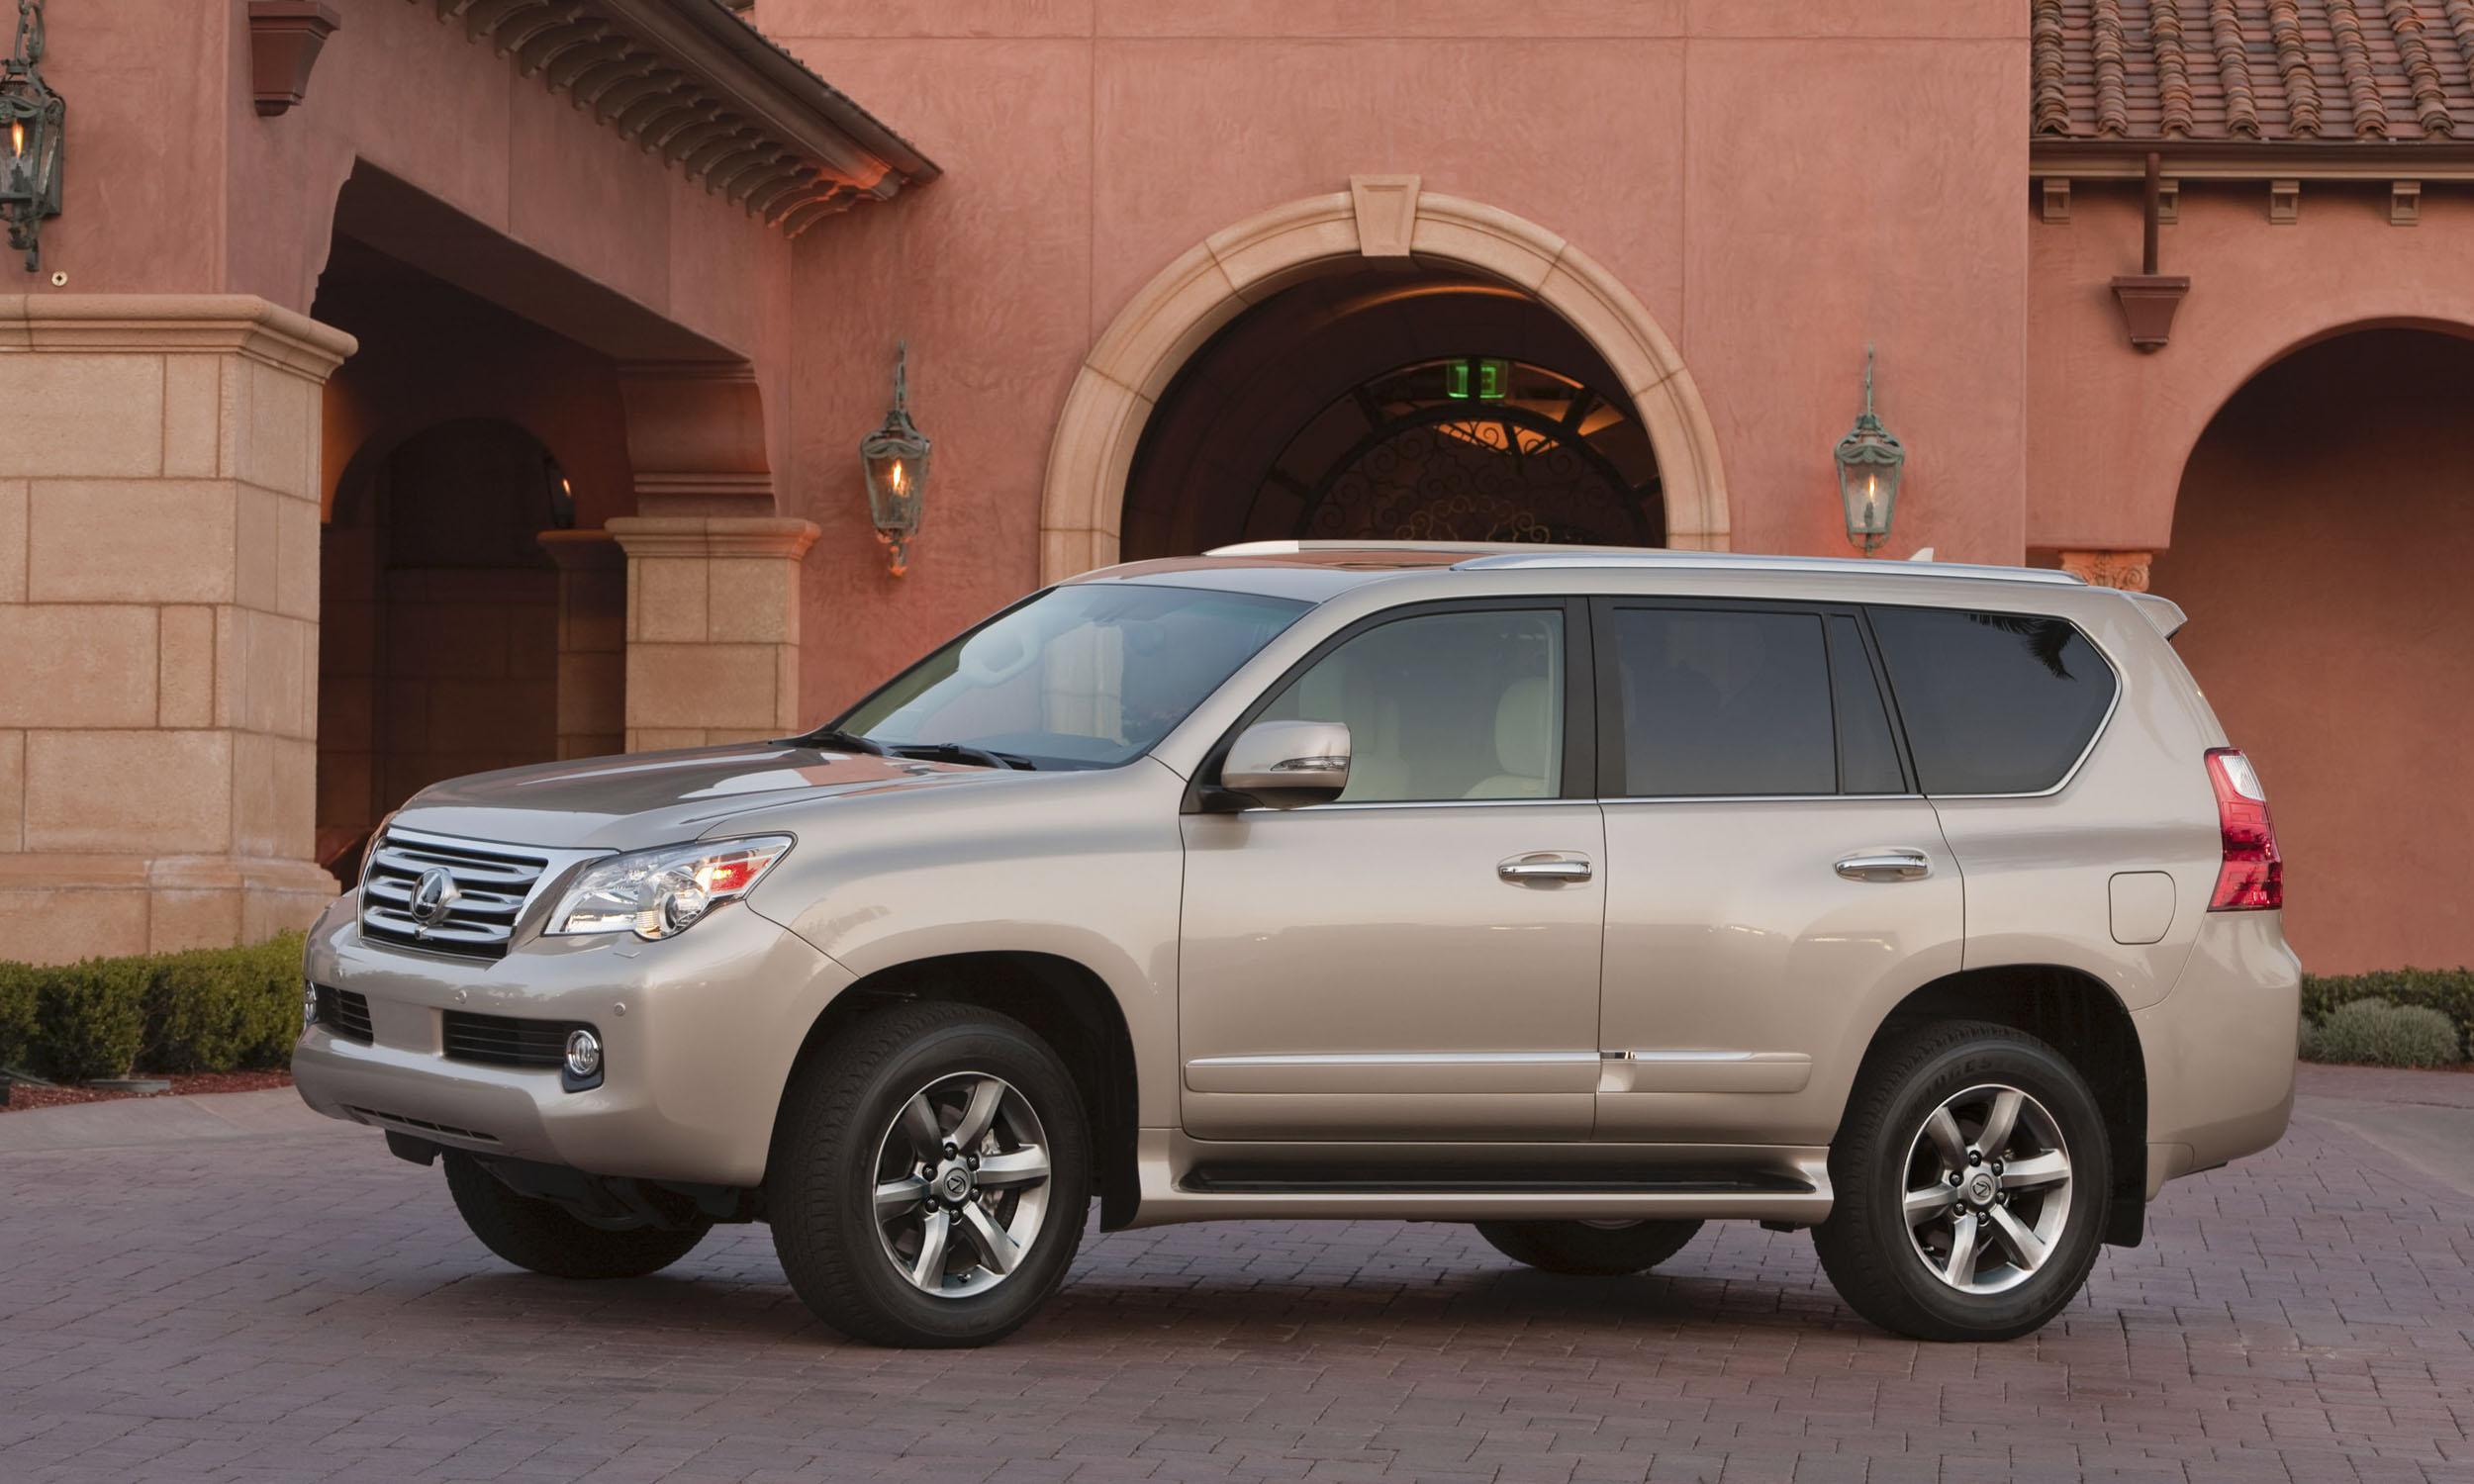 envision pkg suv appearance listing ultra lexus premium awd auto